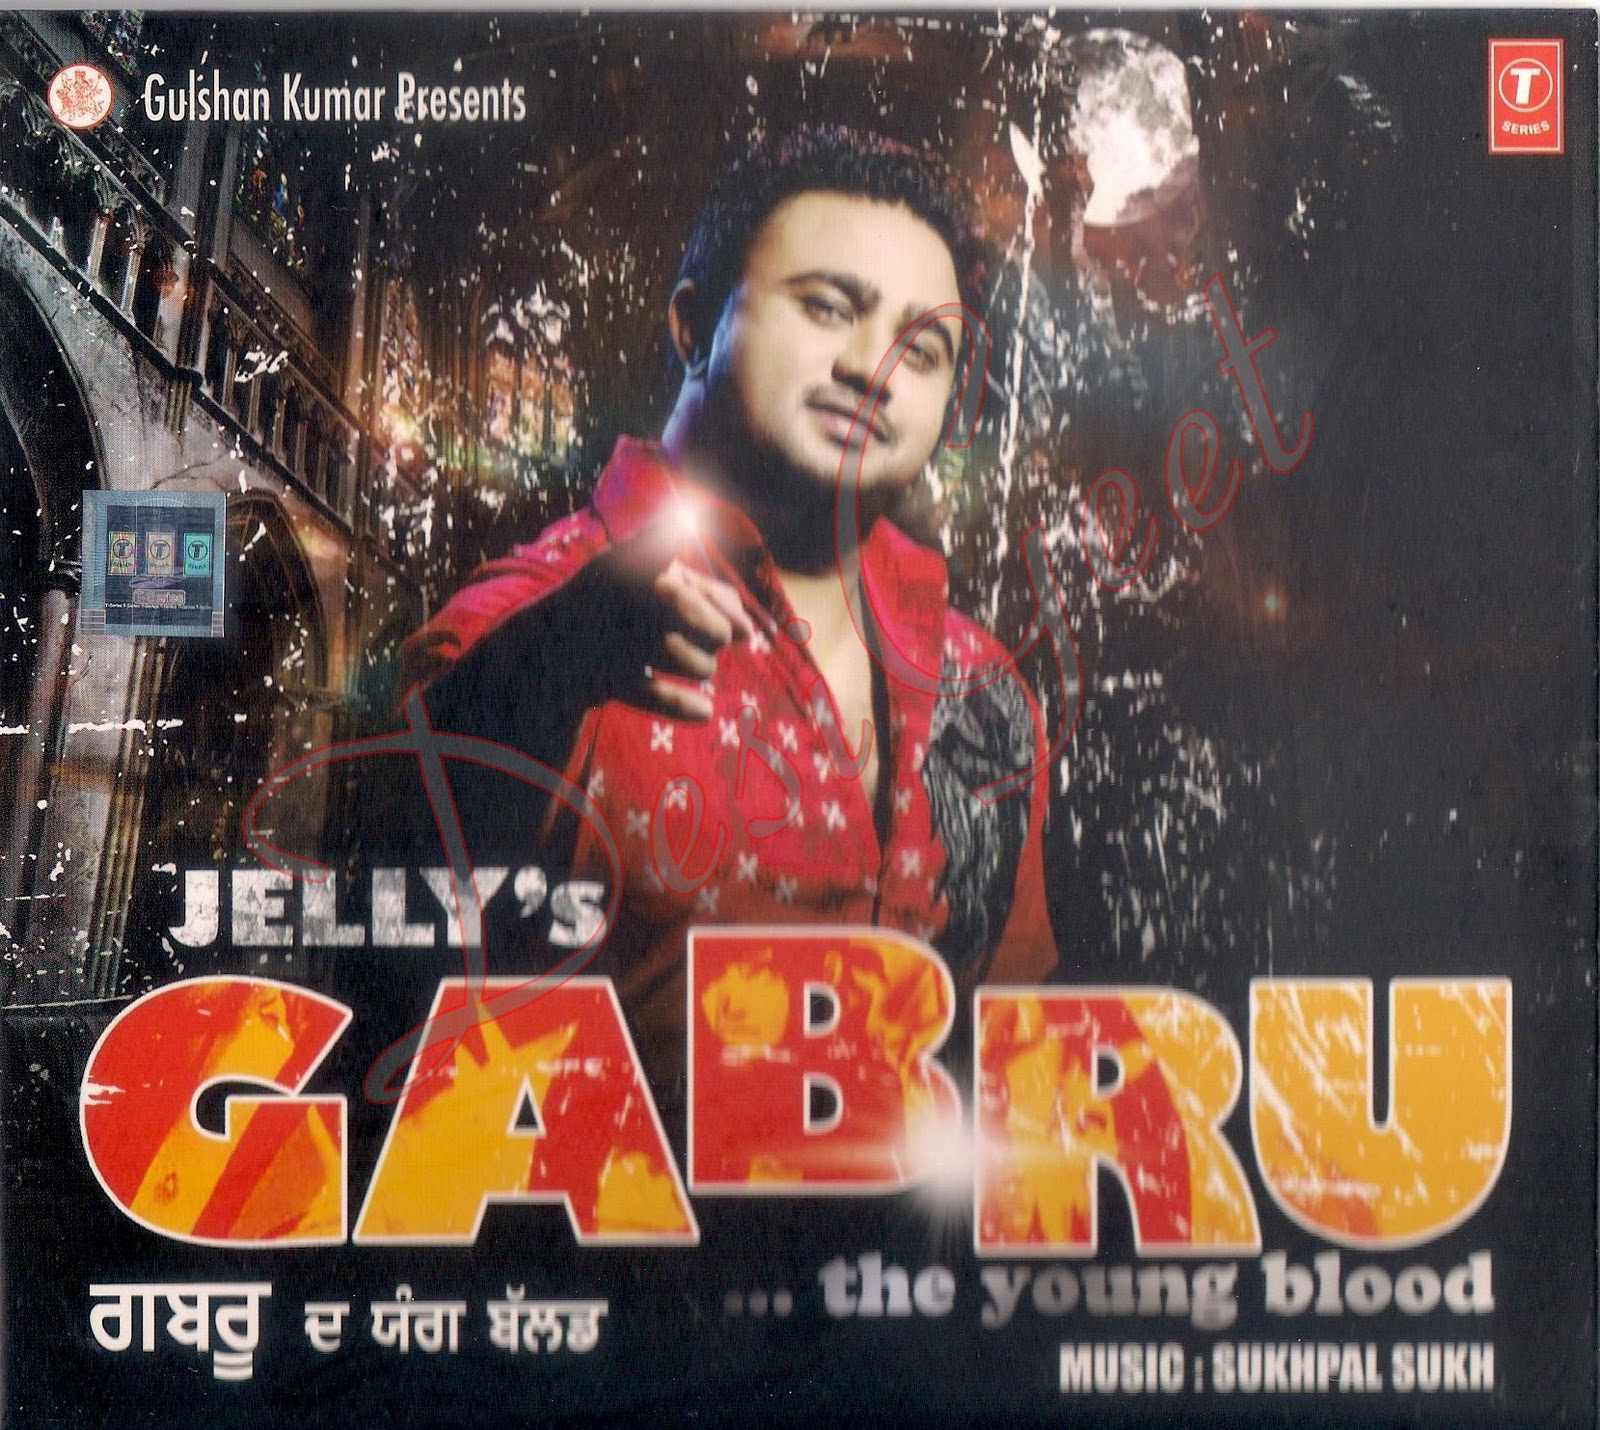 No Need Full Punjabi Song Mp3 Download: Top 101 Reviews: New Punjabi Album Gabru The Young Blood